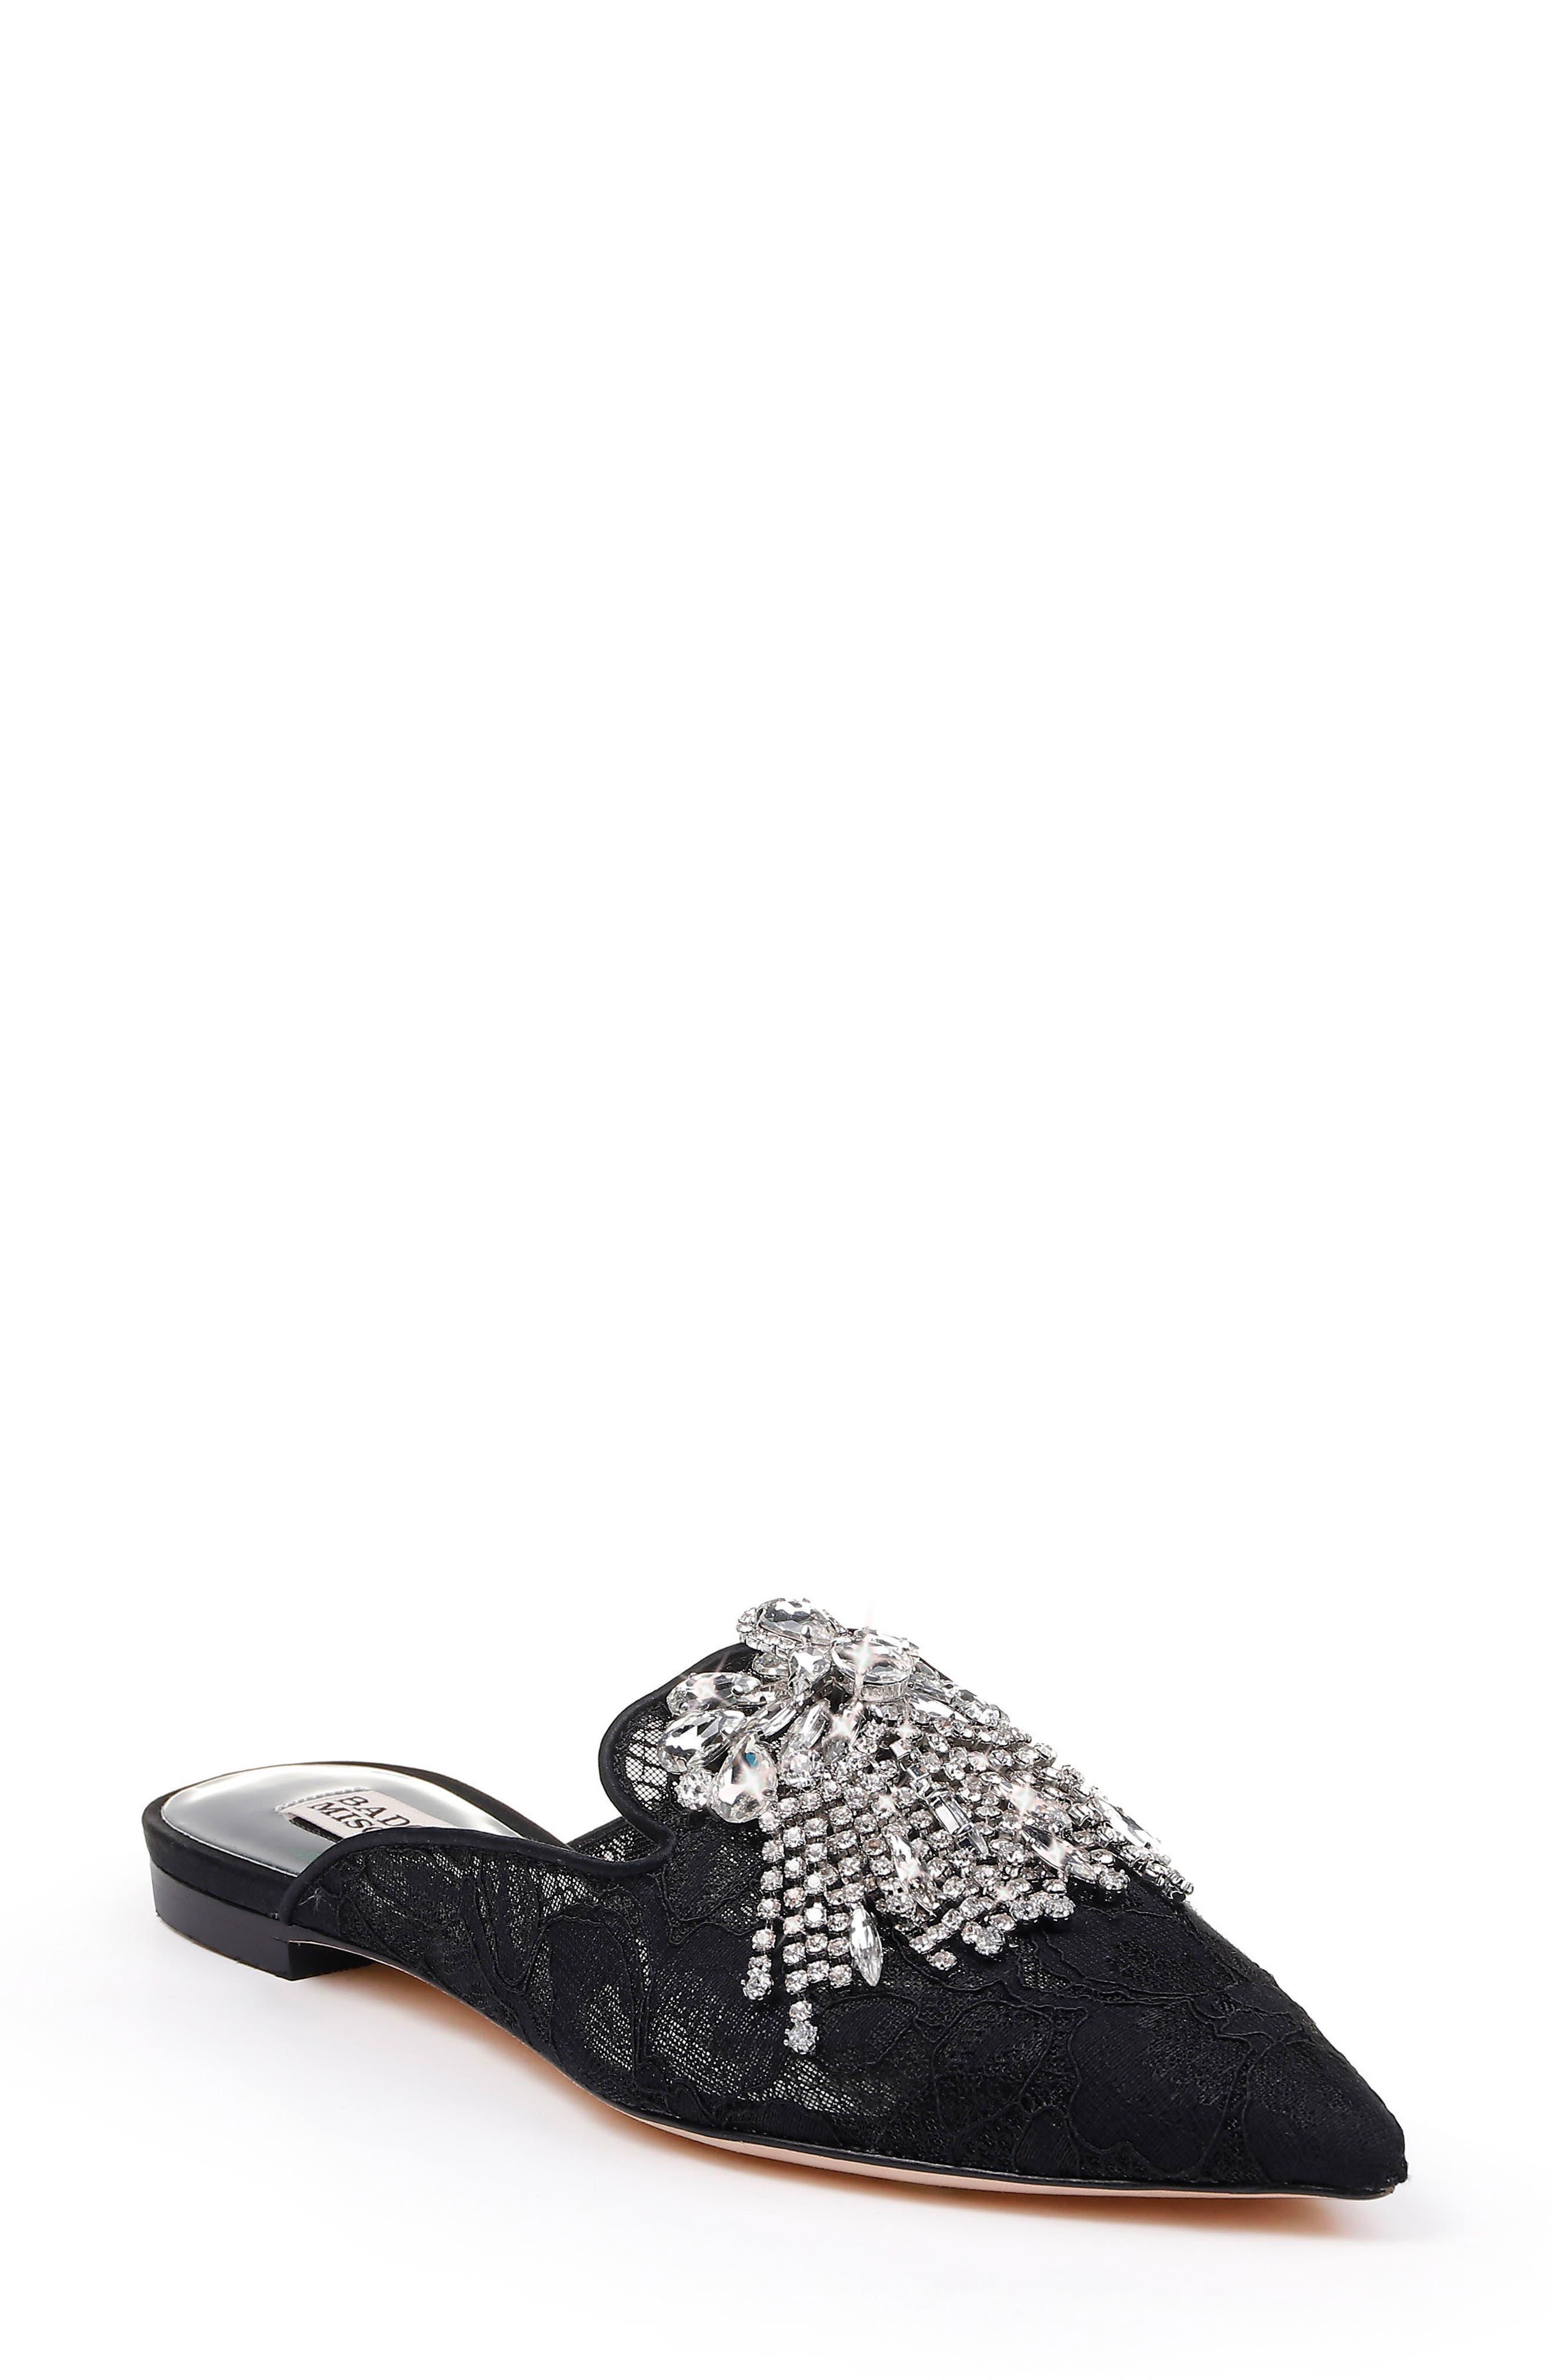 Badgley Mischka Farley Embellished Mule- Black